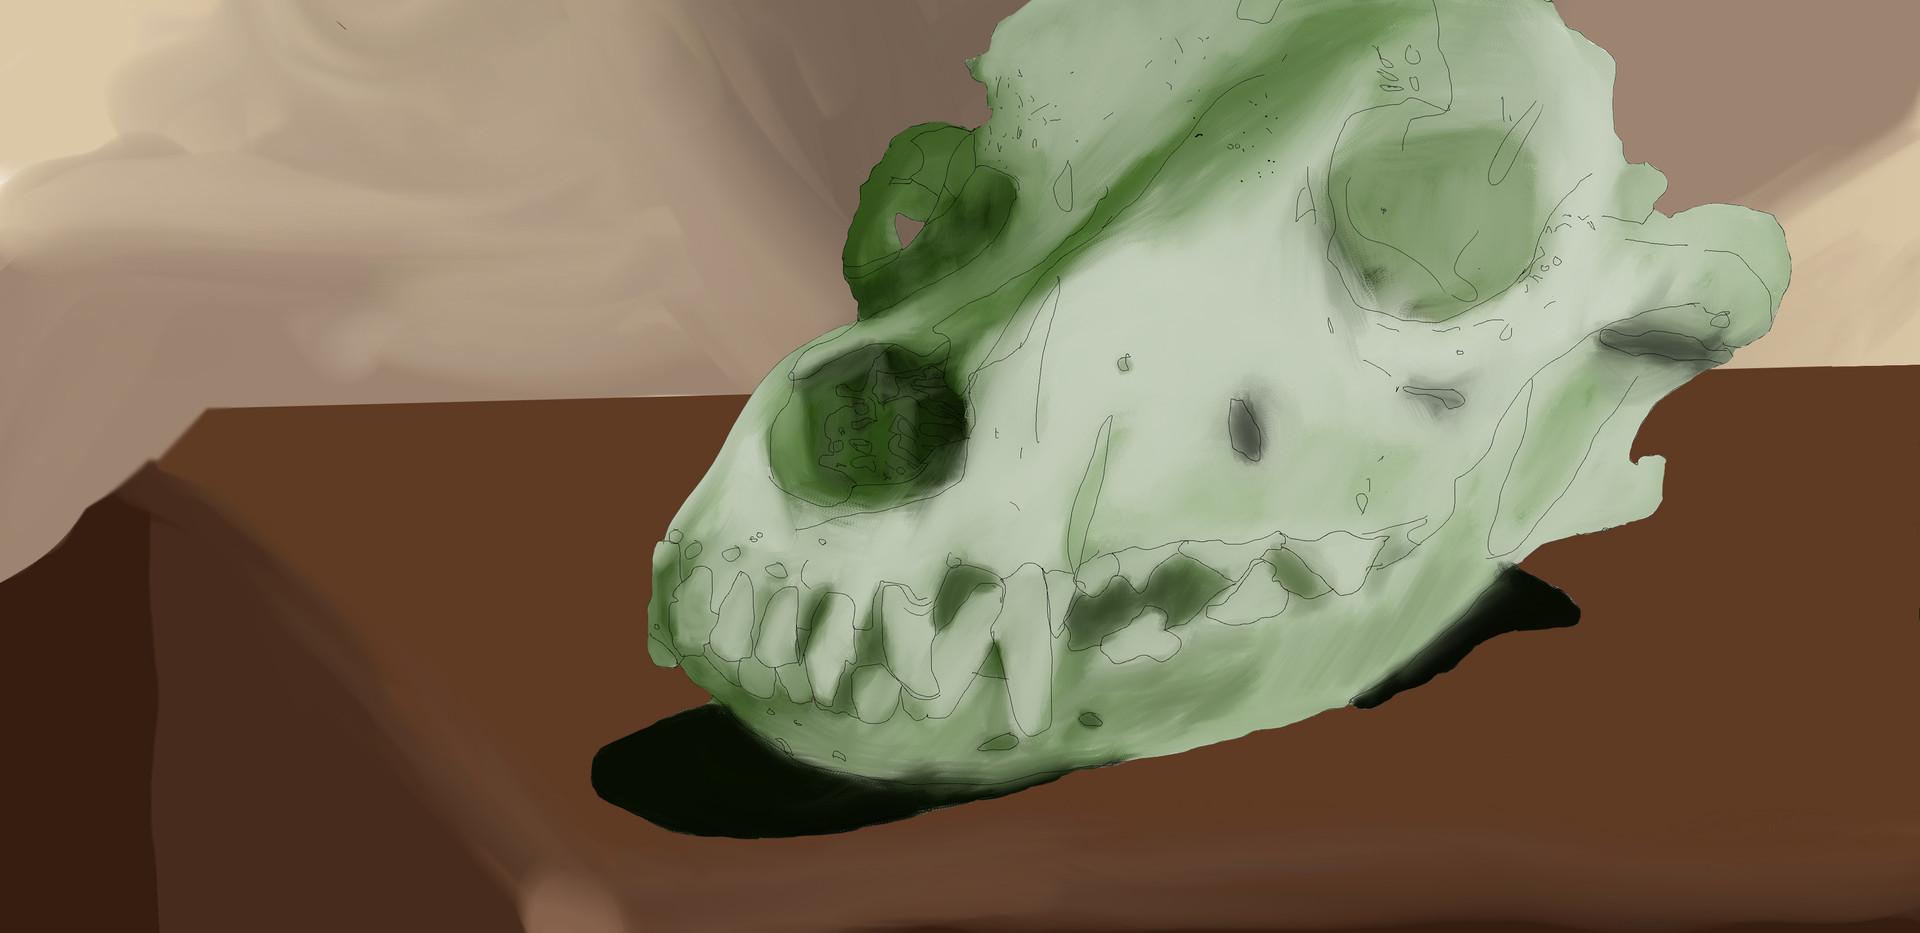 Ryan's Digital skull painting